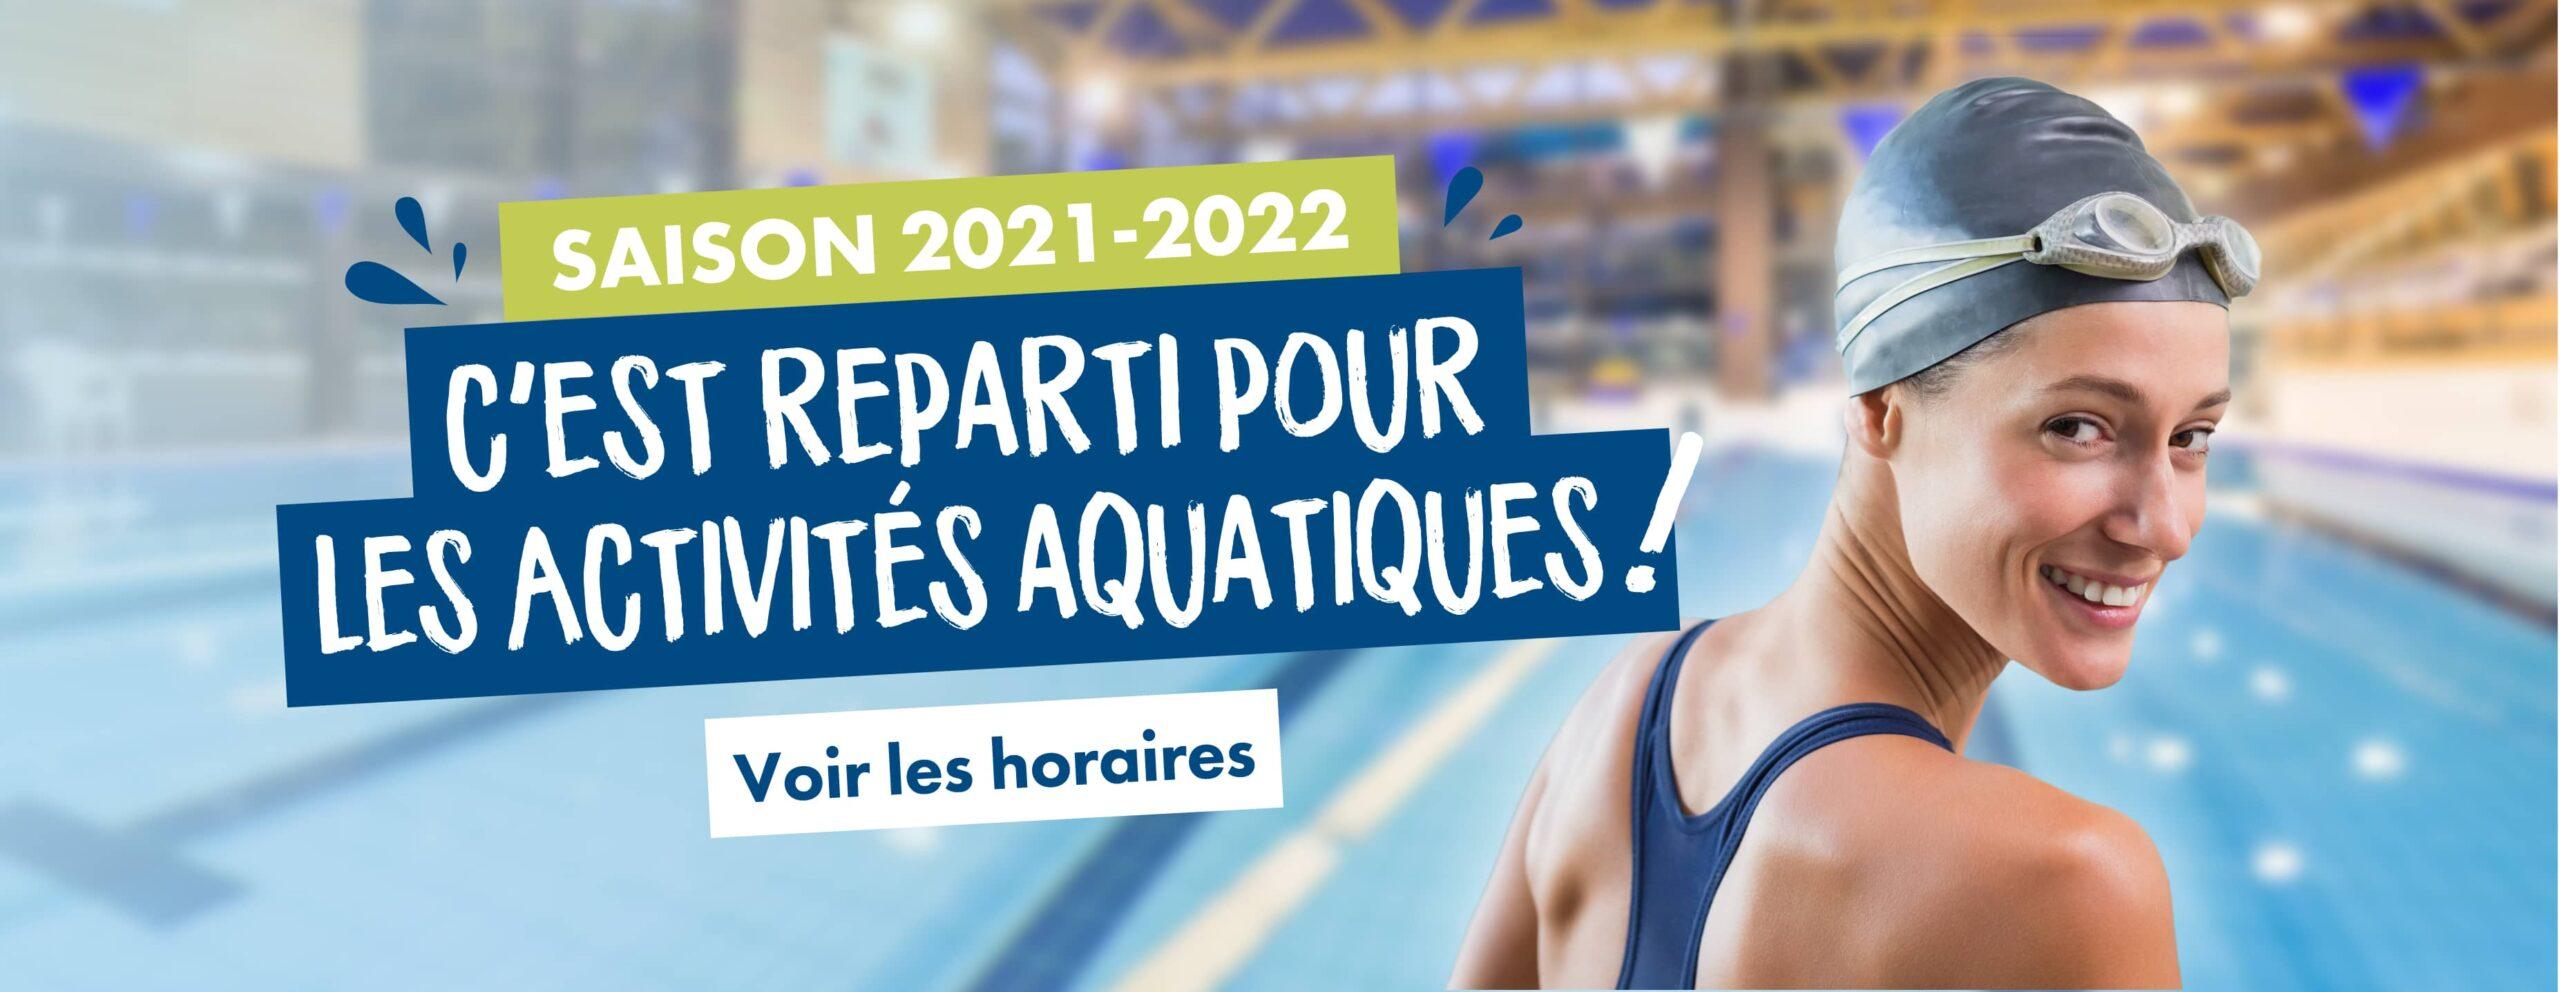 BANNIERE_RENTREE_2021-2022_COMPRESS